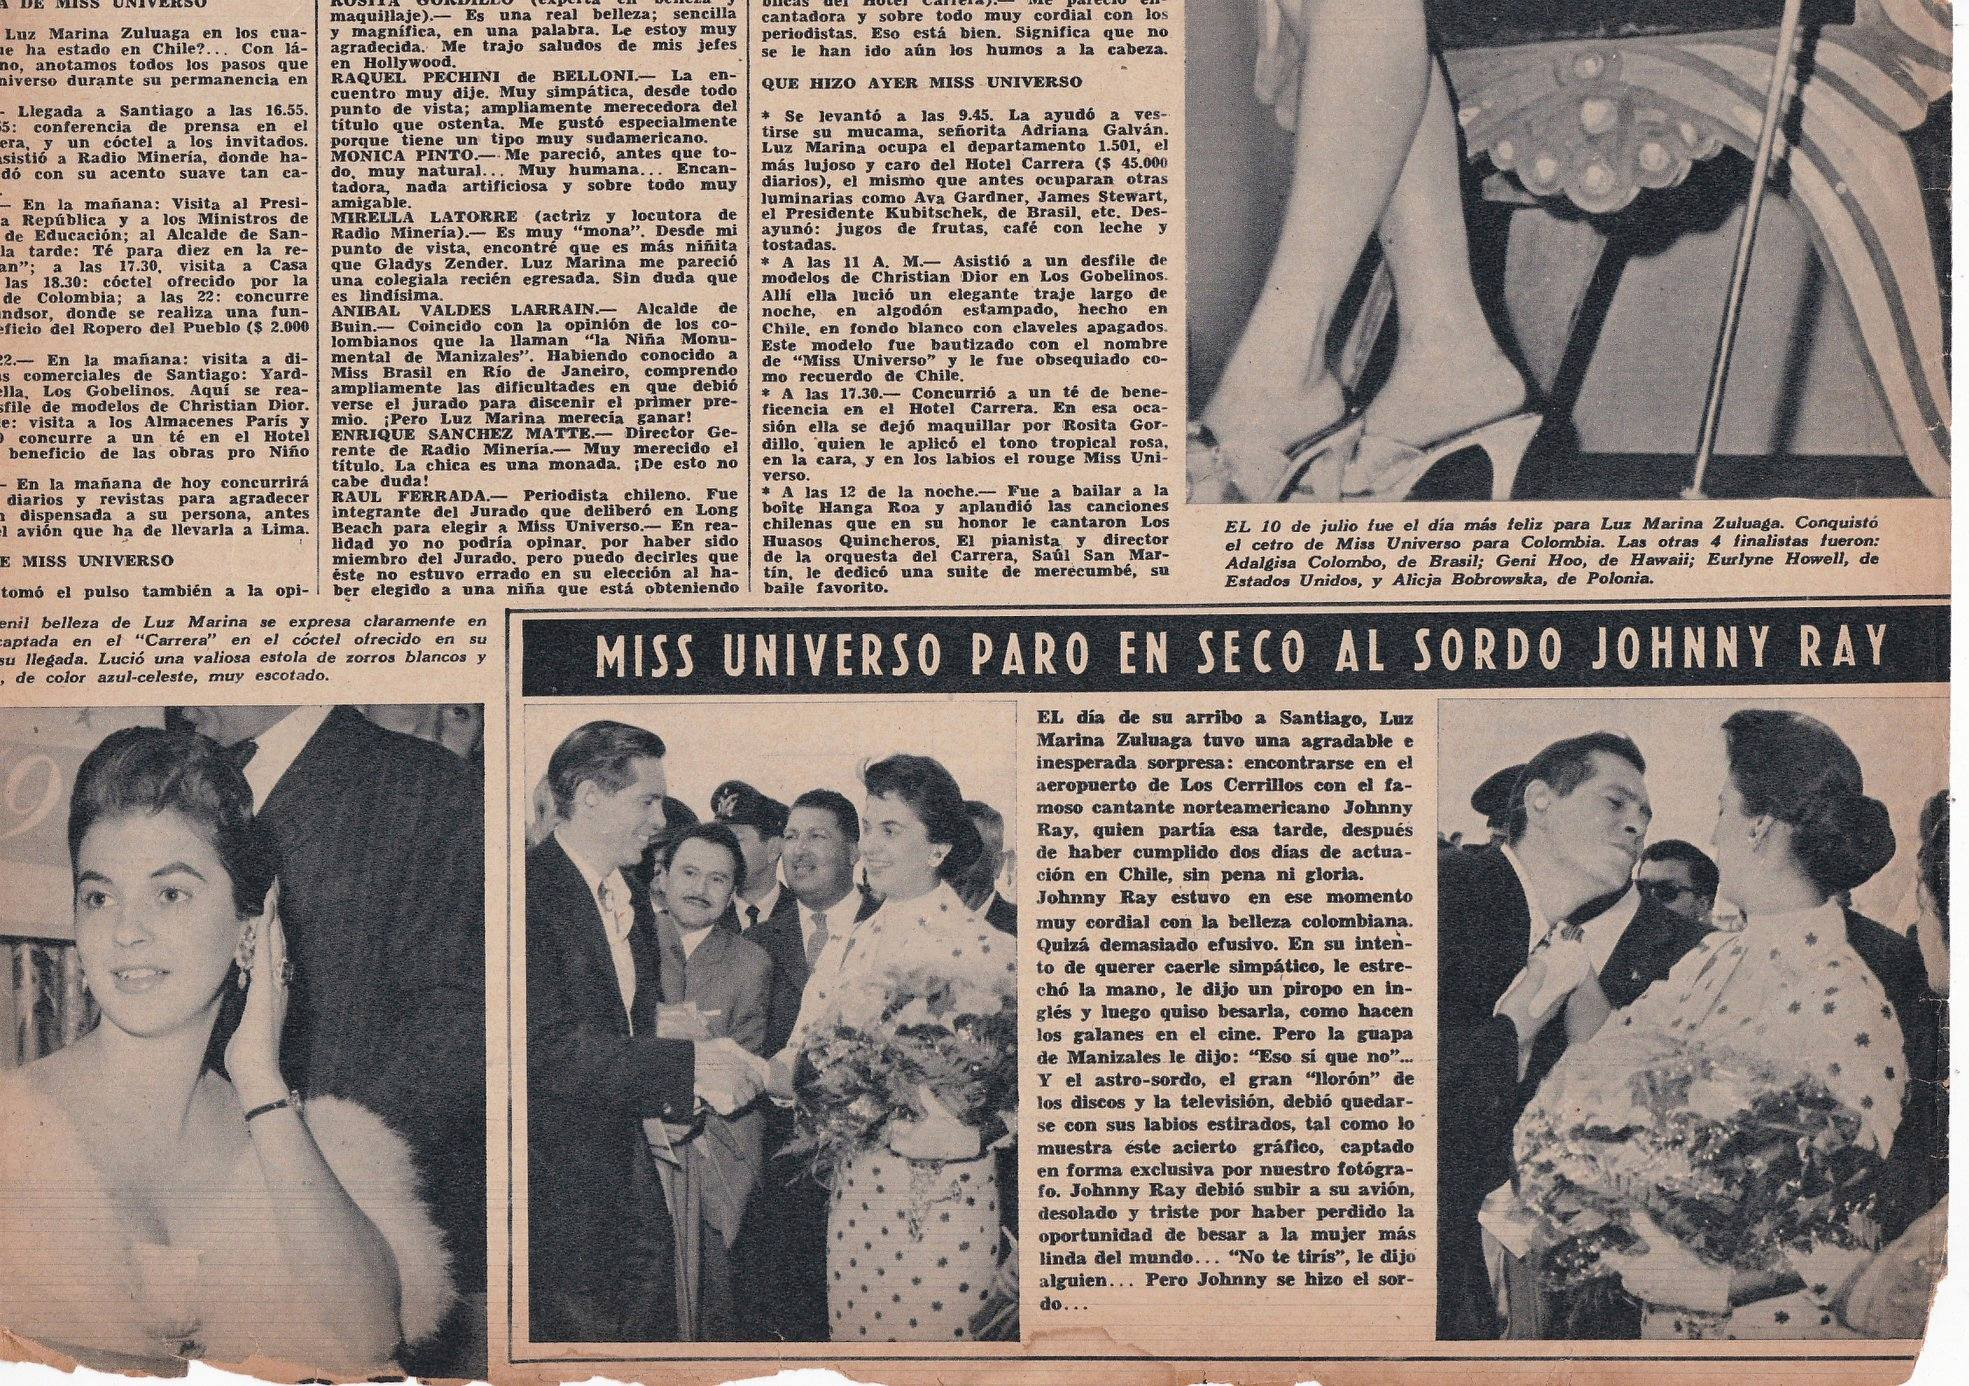 luz marina zuluaga, miss universe 1958. † - Página 5 92710310